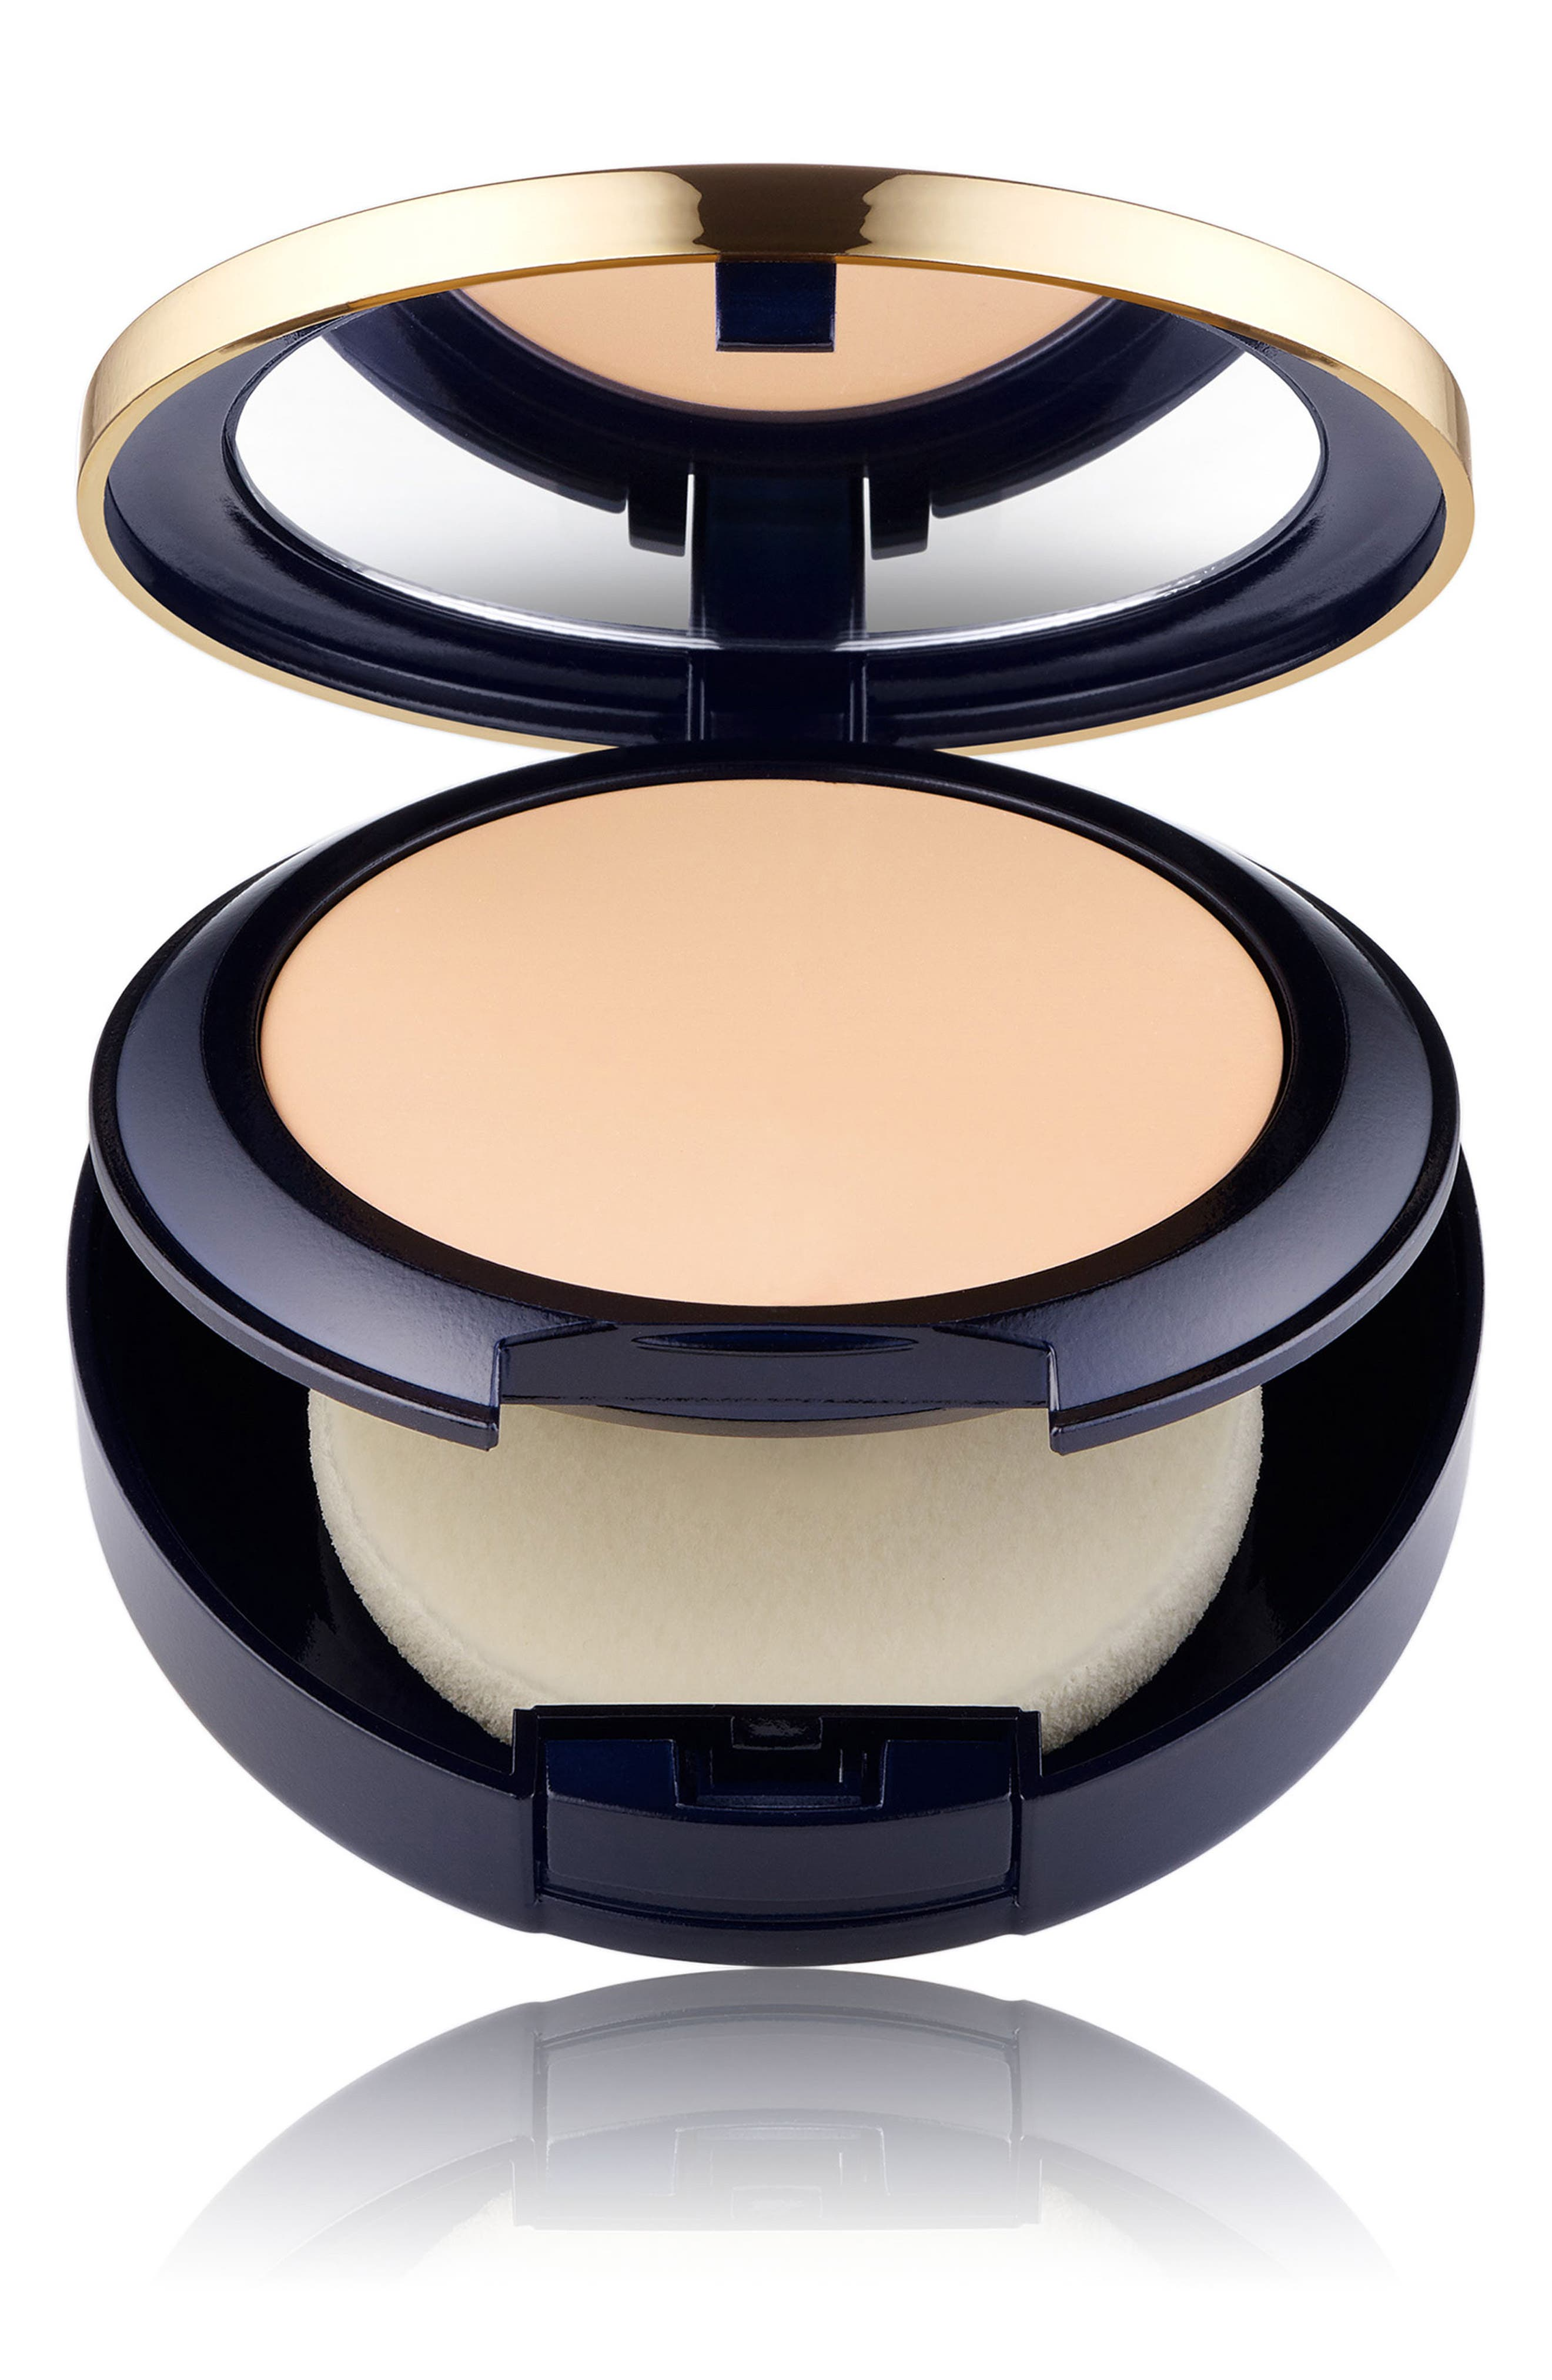 Estee Lauder Double Wear Stay In Place Matte Powder Foundation - 3C1 Dusk